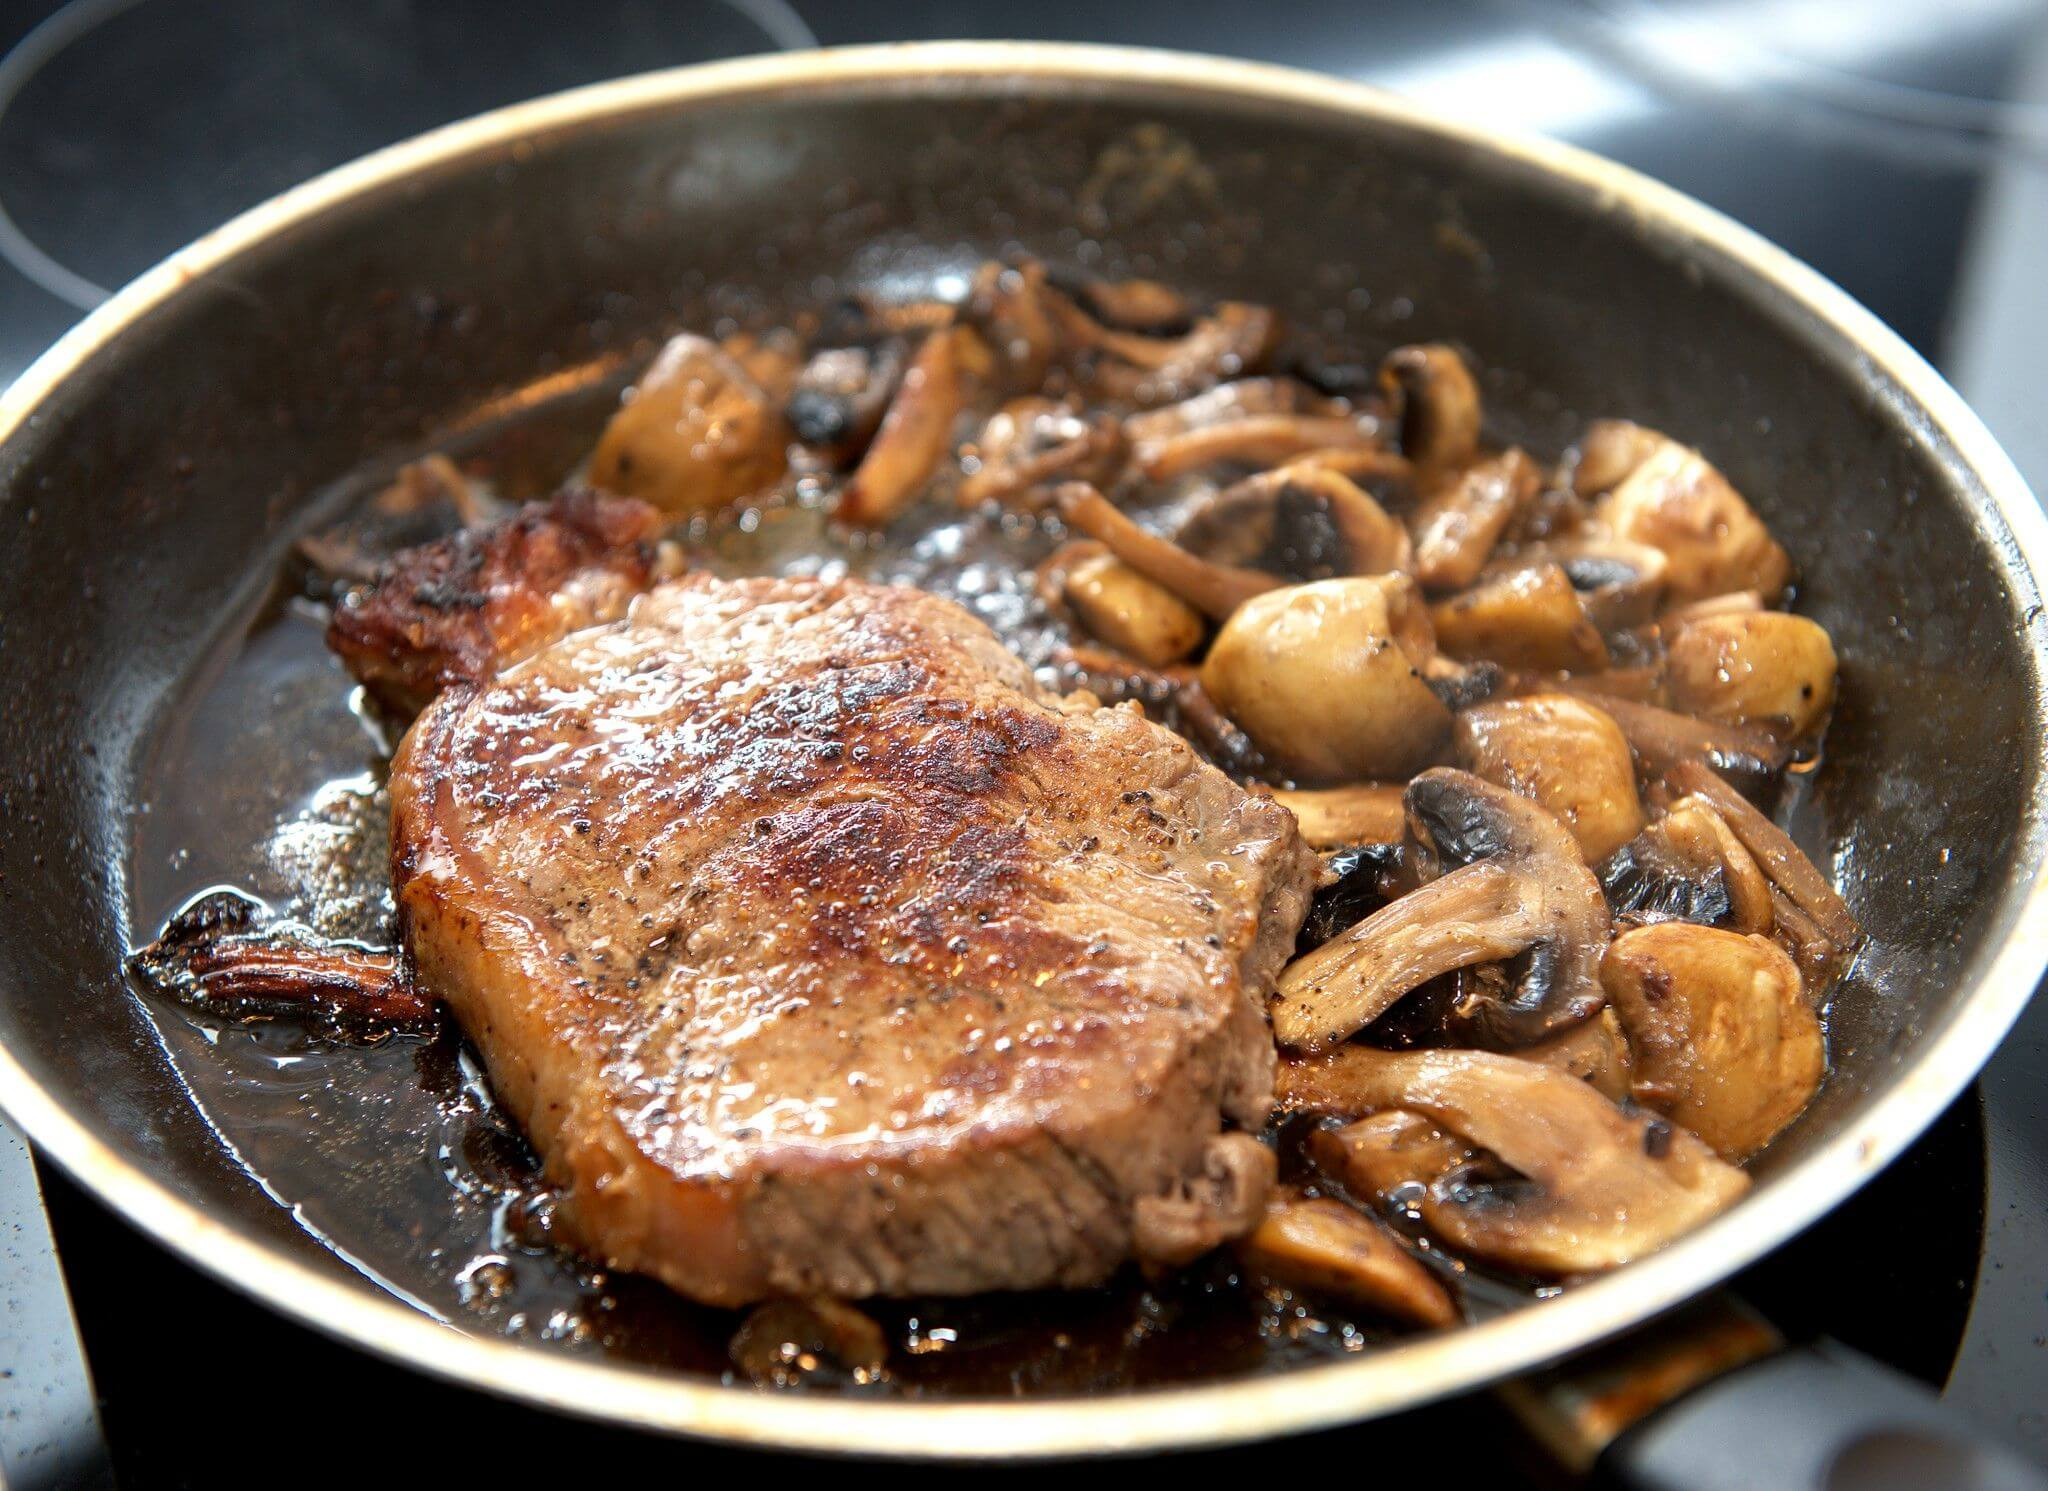 How to Reheat Steak Without Losing Taste : Steak University